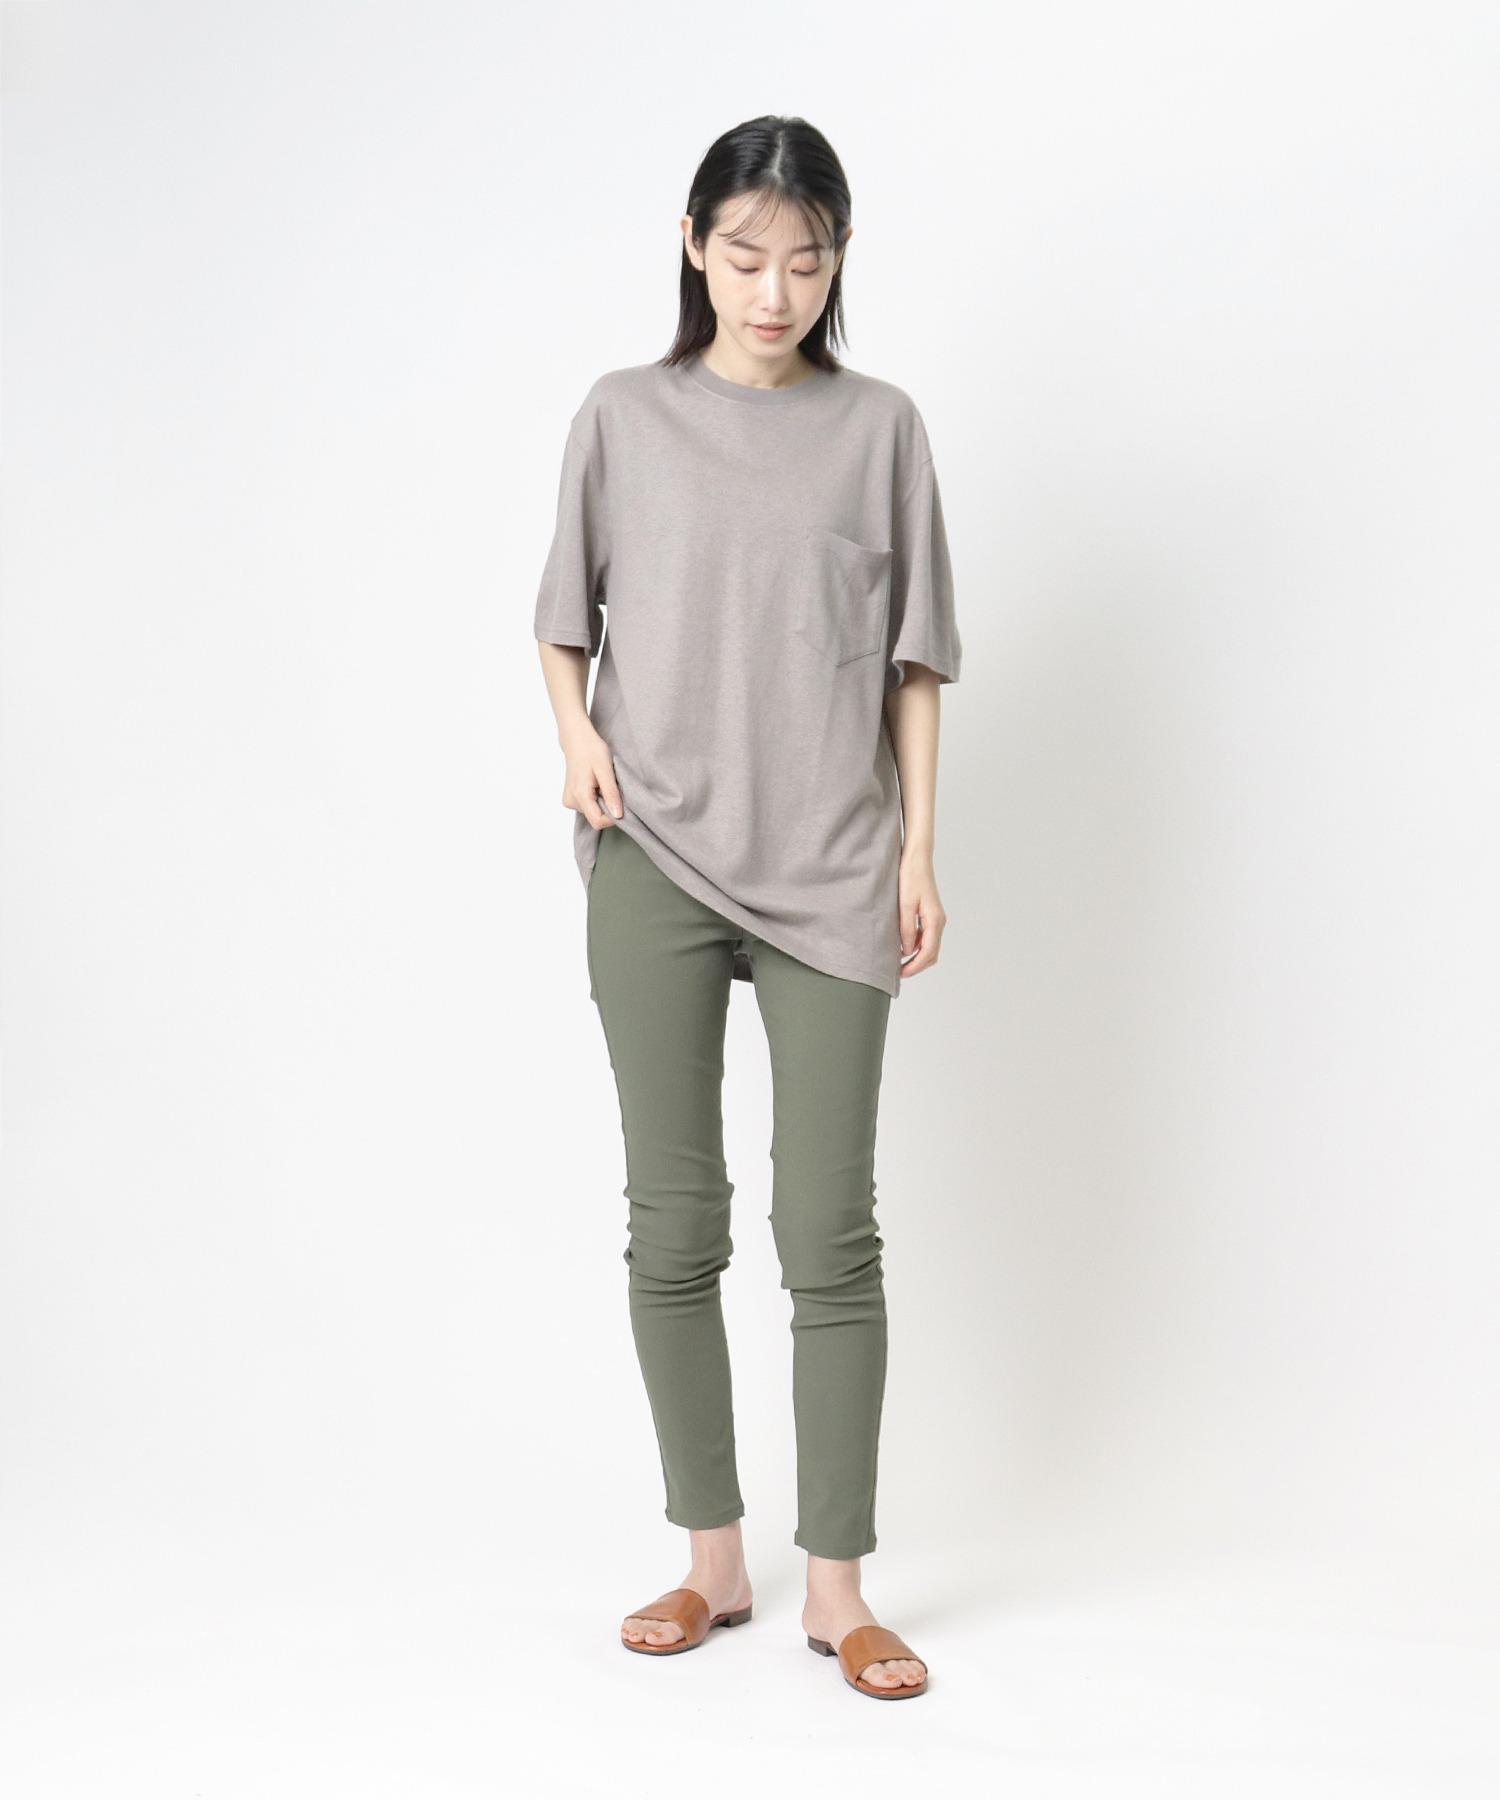 【 GOODWEAR / グッドウェア 】レギュラーフィット 半袖クルーネックポケットTシャツ ヘンプコットン